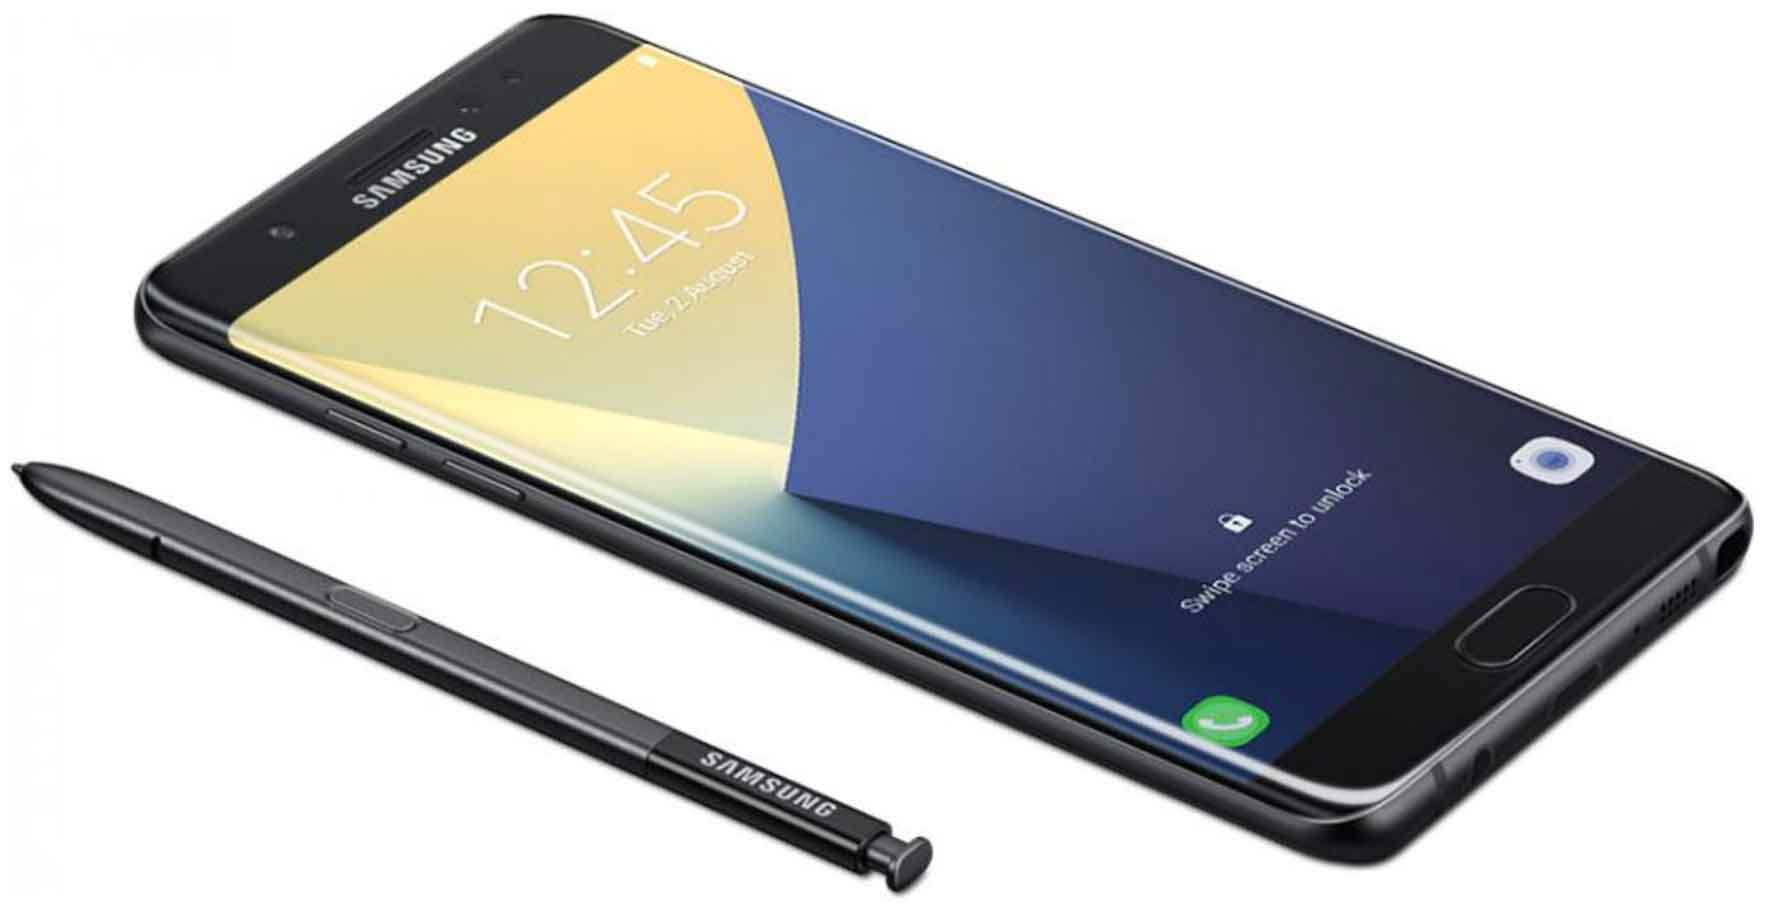 Samsung Galaxy Note 8 avrà un Infinity Display da 6.3 pollici